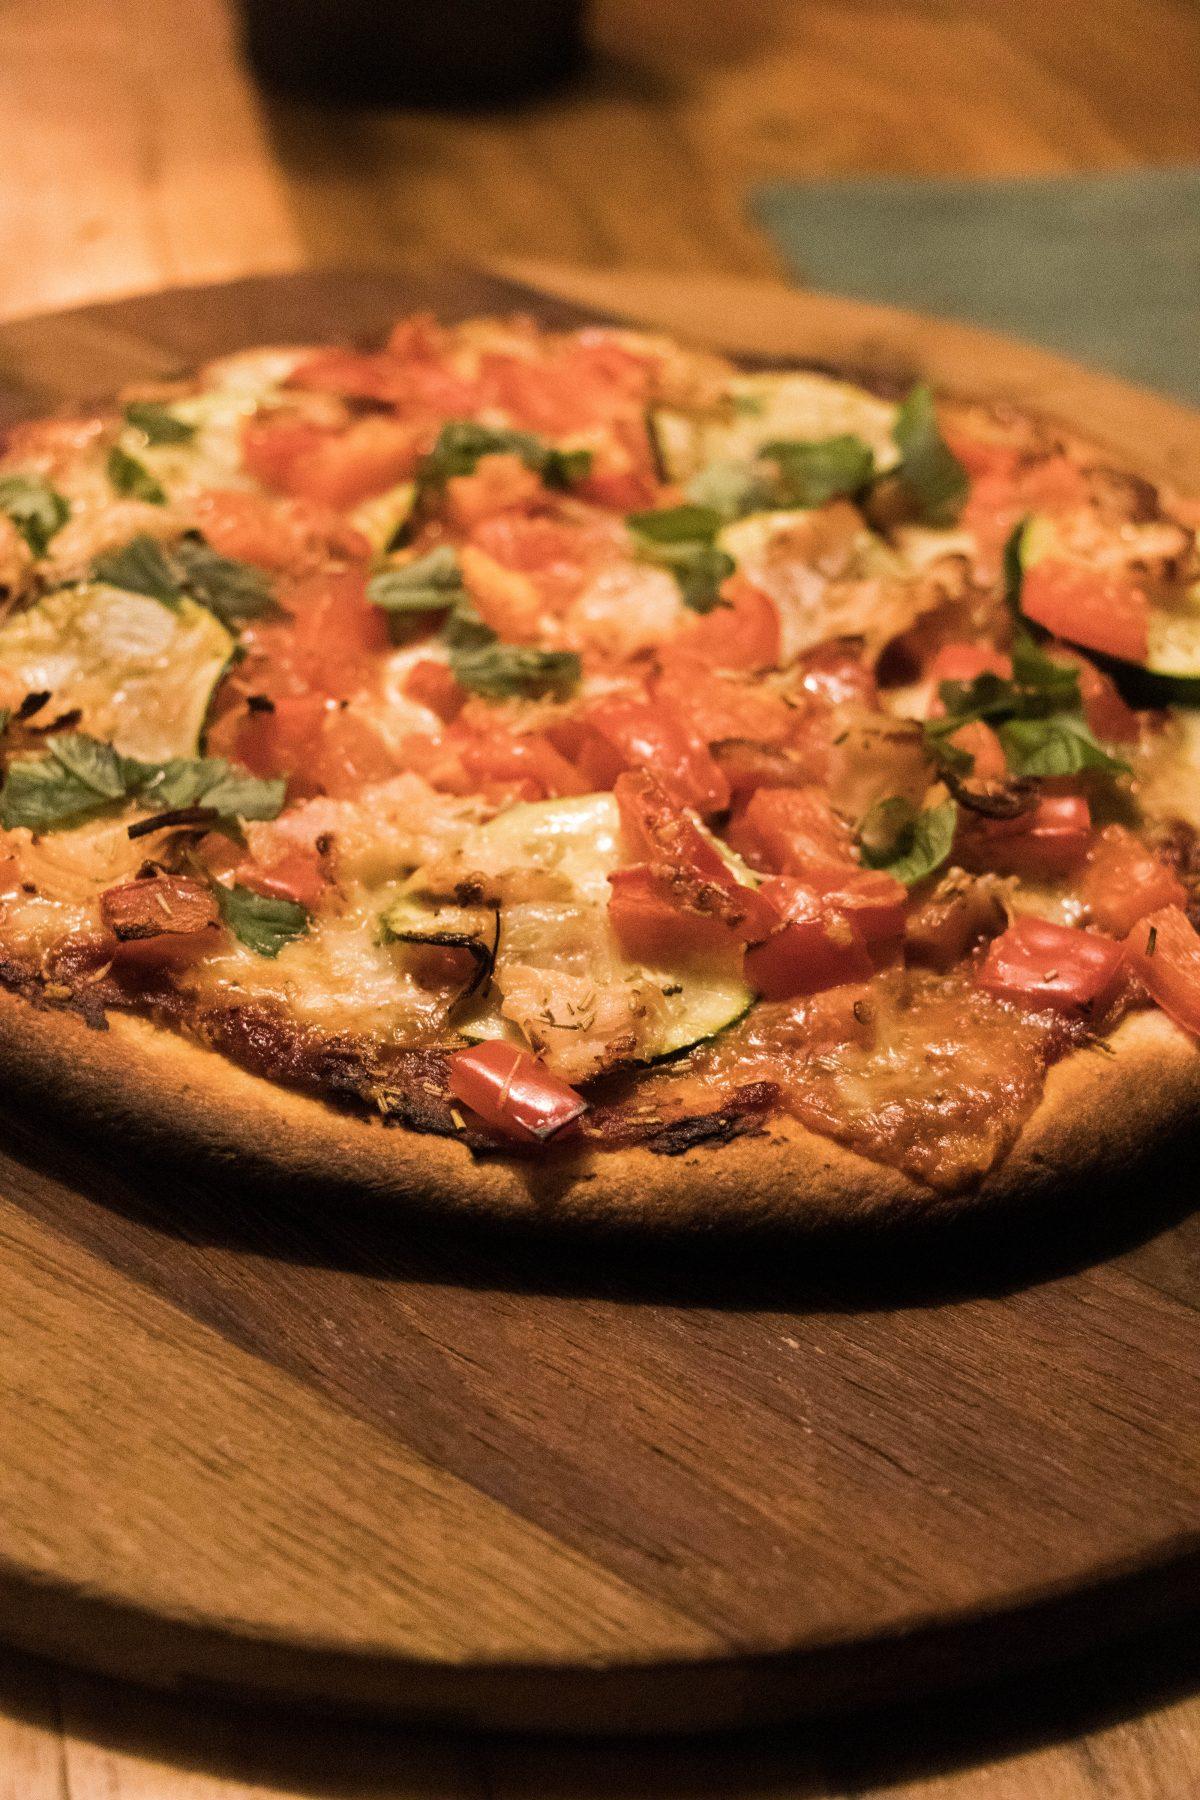 Bloemkoolpizzabodem met buffelmozzarella, paprika en verse basilicum